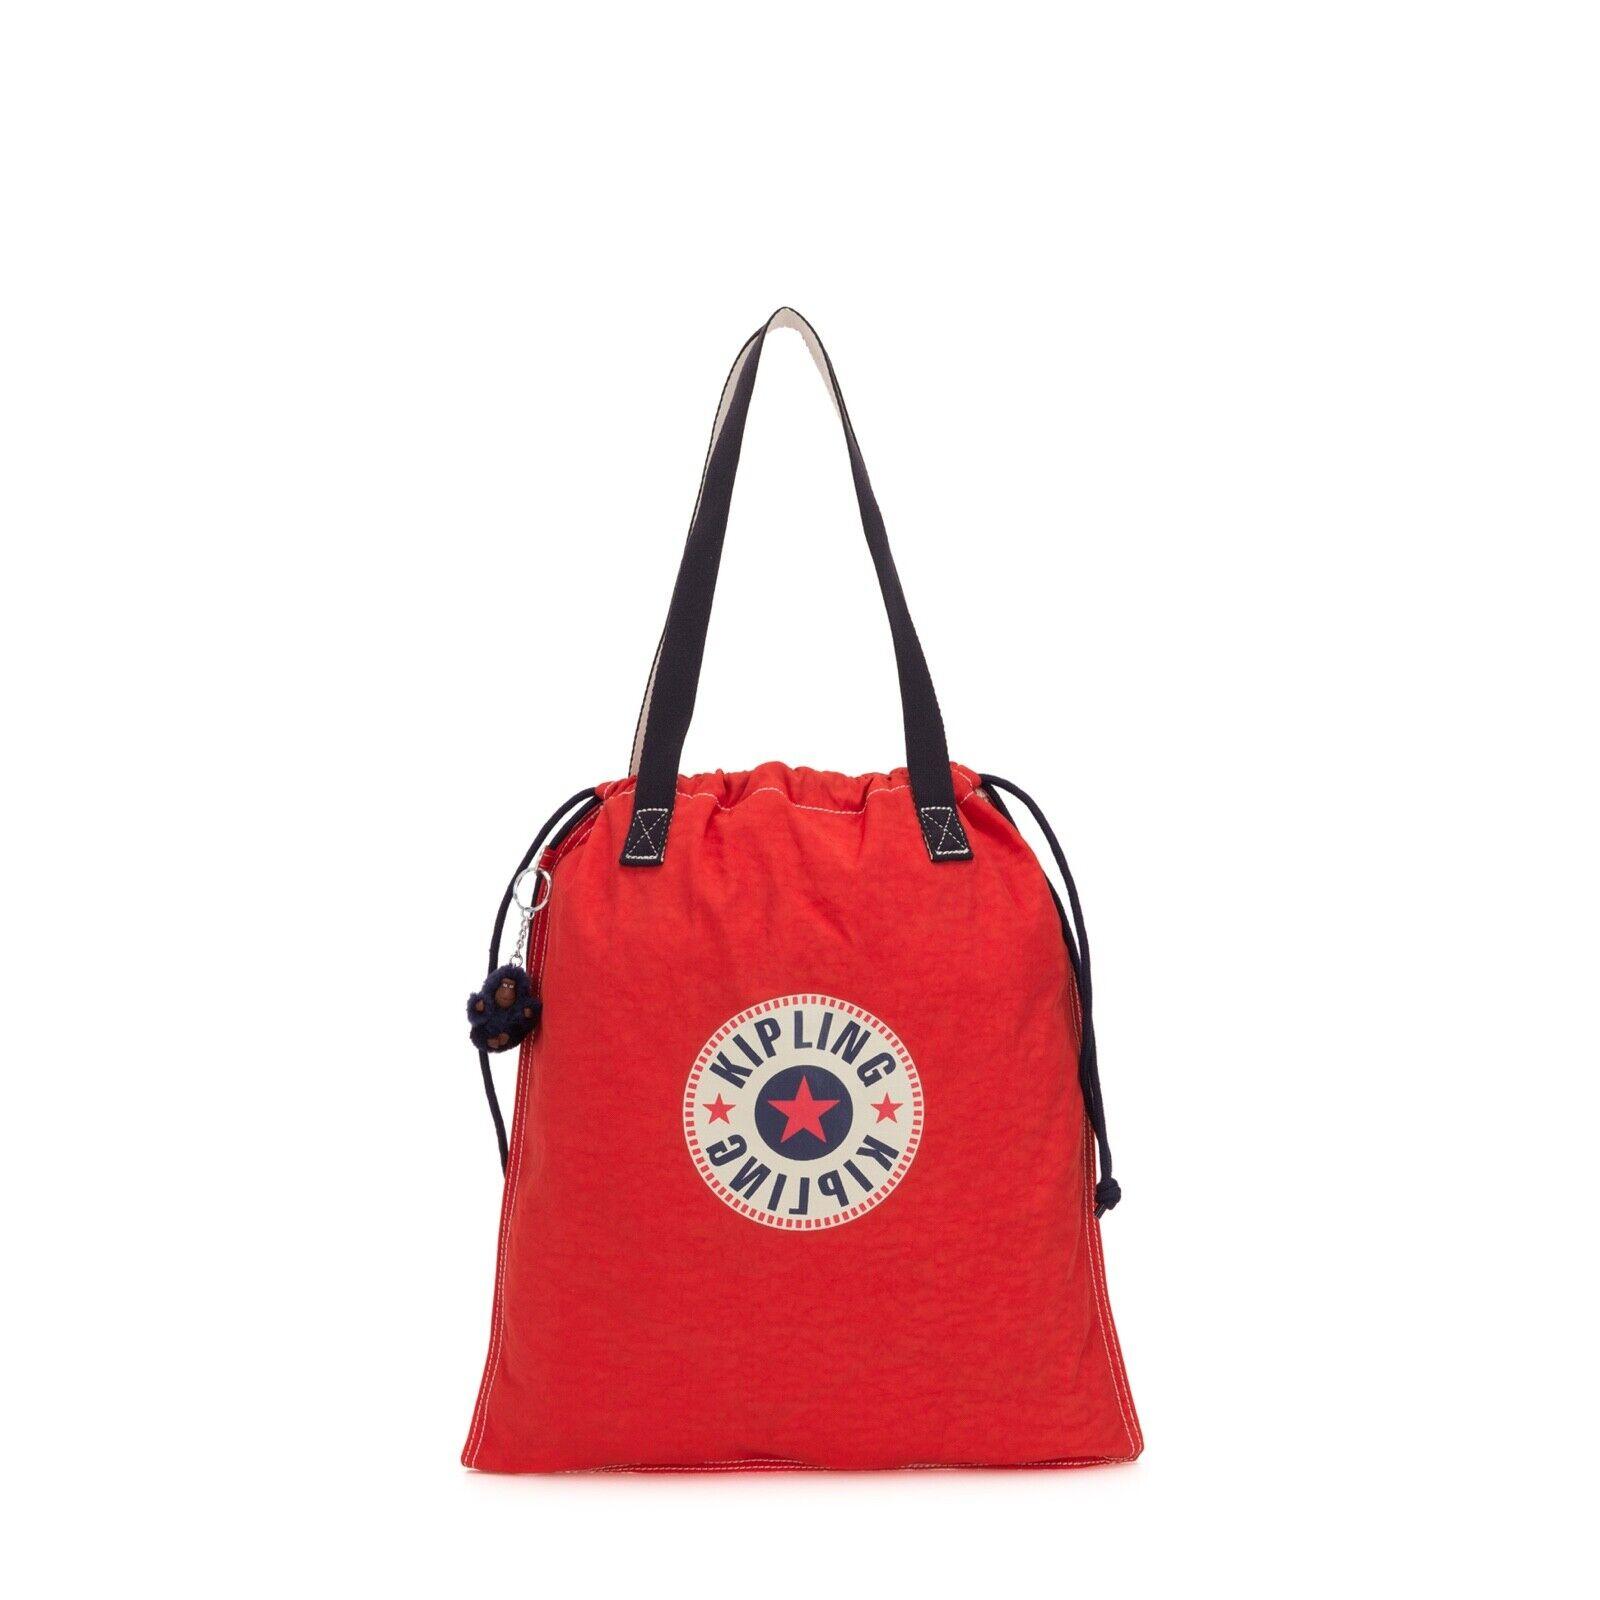 Kipling New Hip Hurray Active Red BL Foldable Tote//Shopper//Handbag BNWT